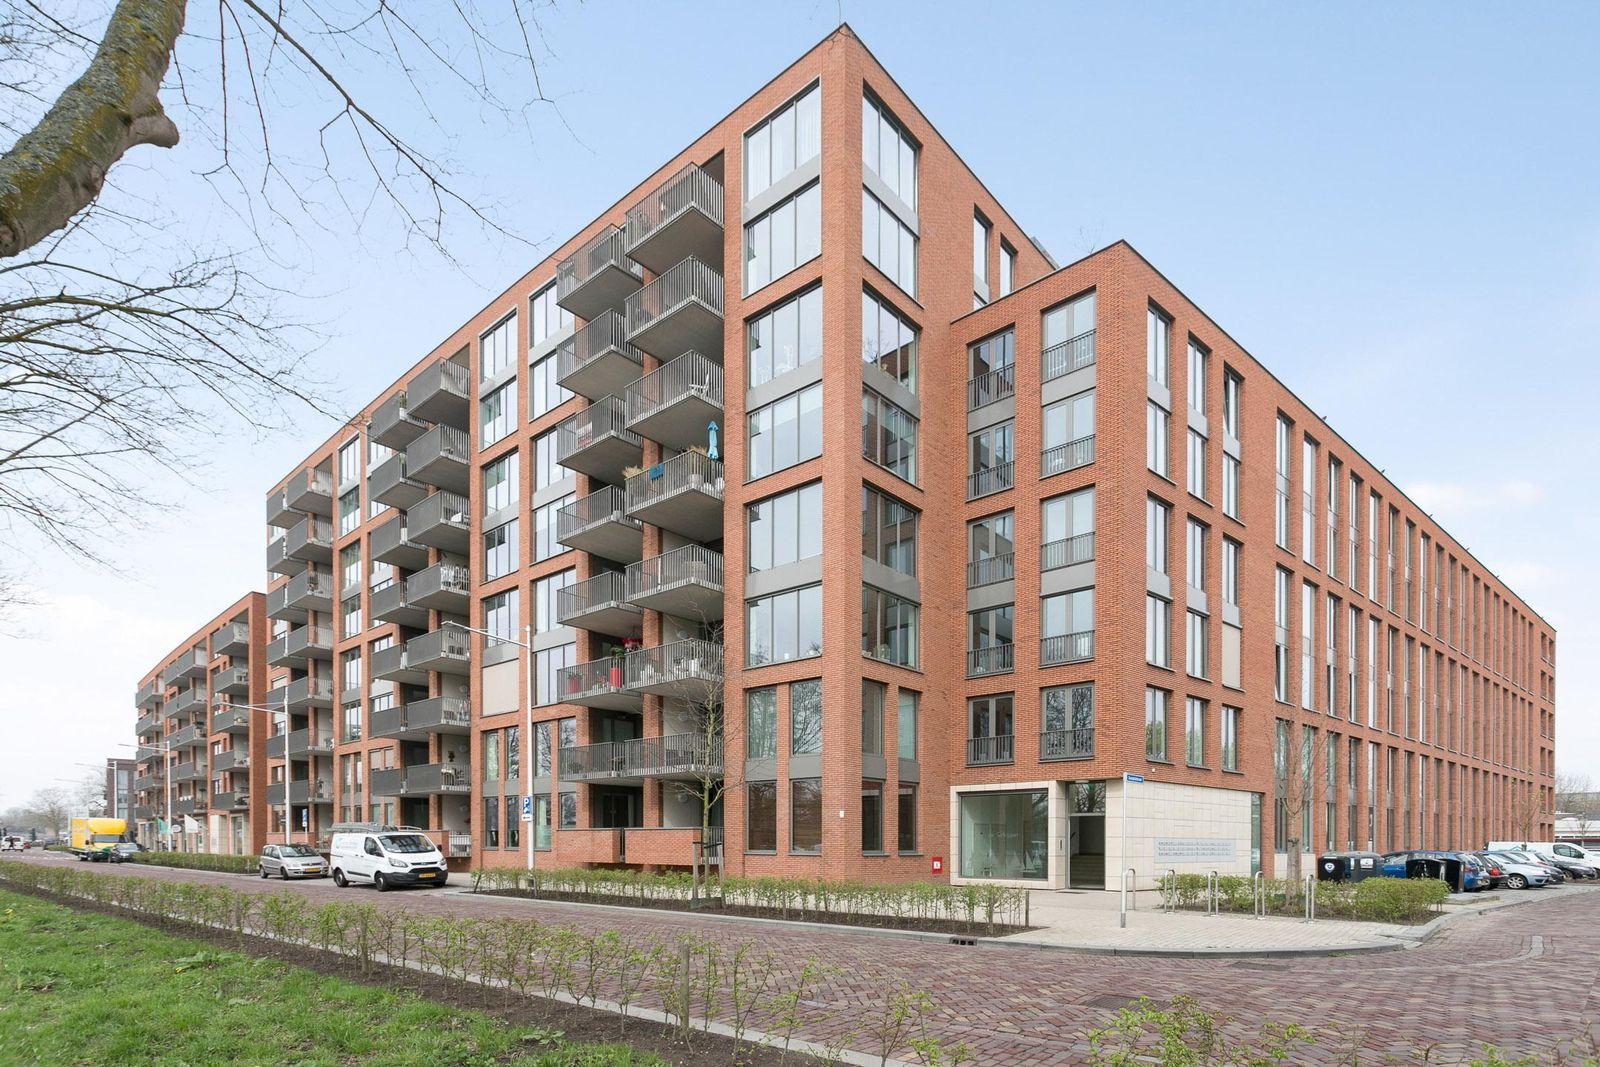 Havendijk 55-29, Tilburg